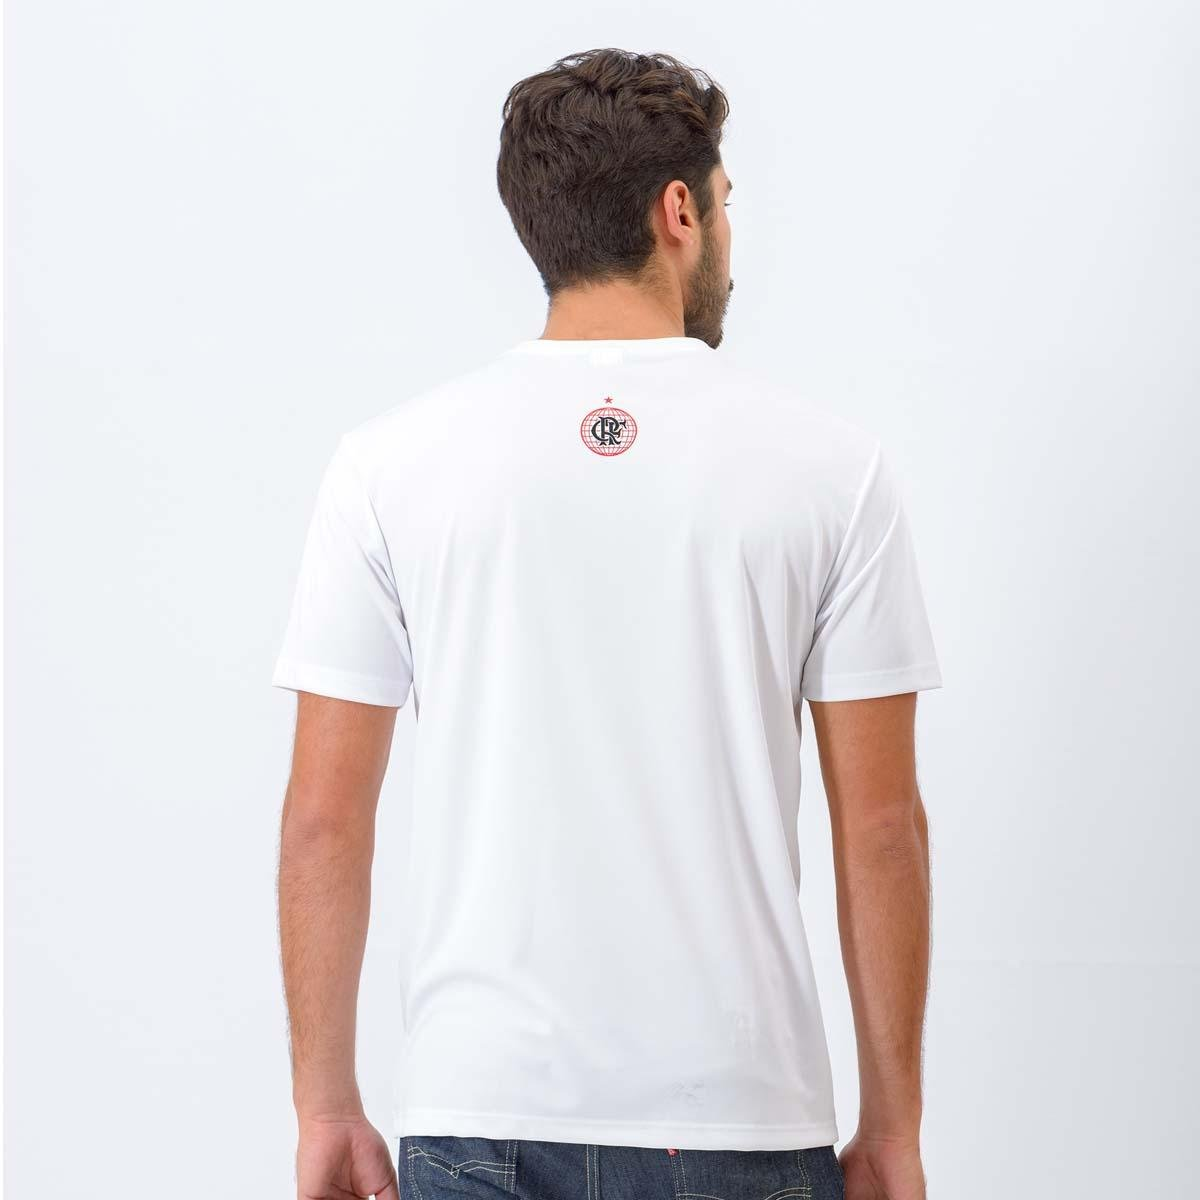 Camiseta Flamengo Globo Braziline Masculina  Camiseta Flamengo Globo  Braziline Masculina 3788abfe4ea7f